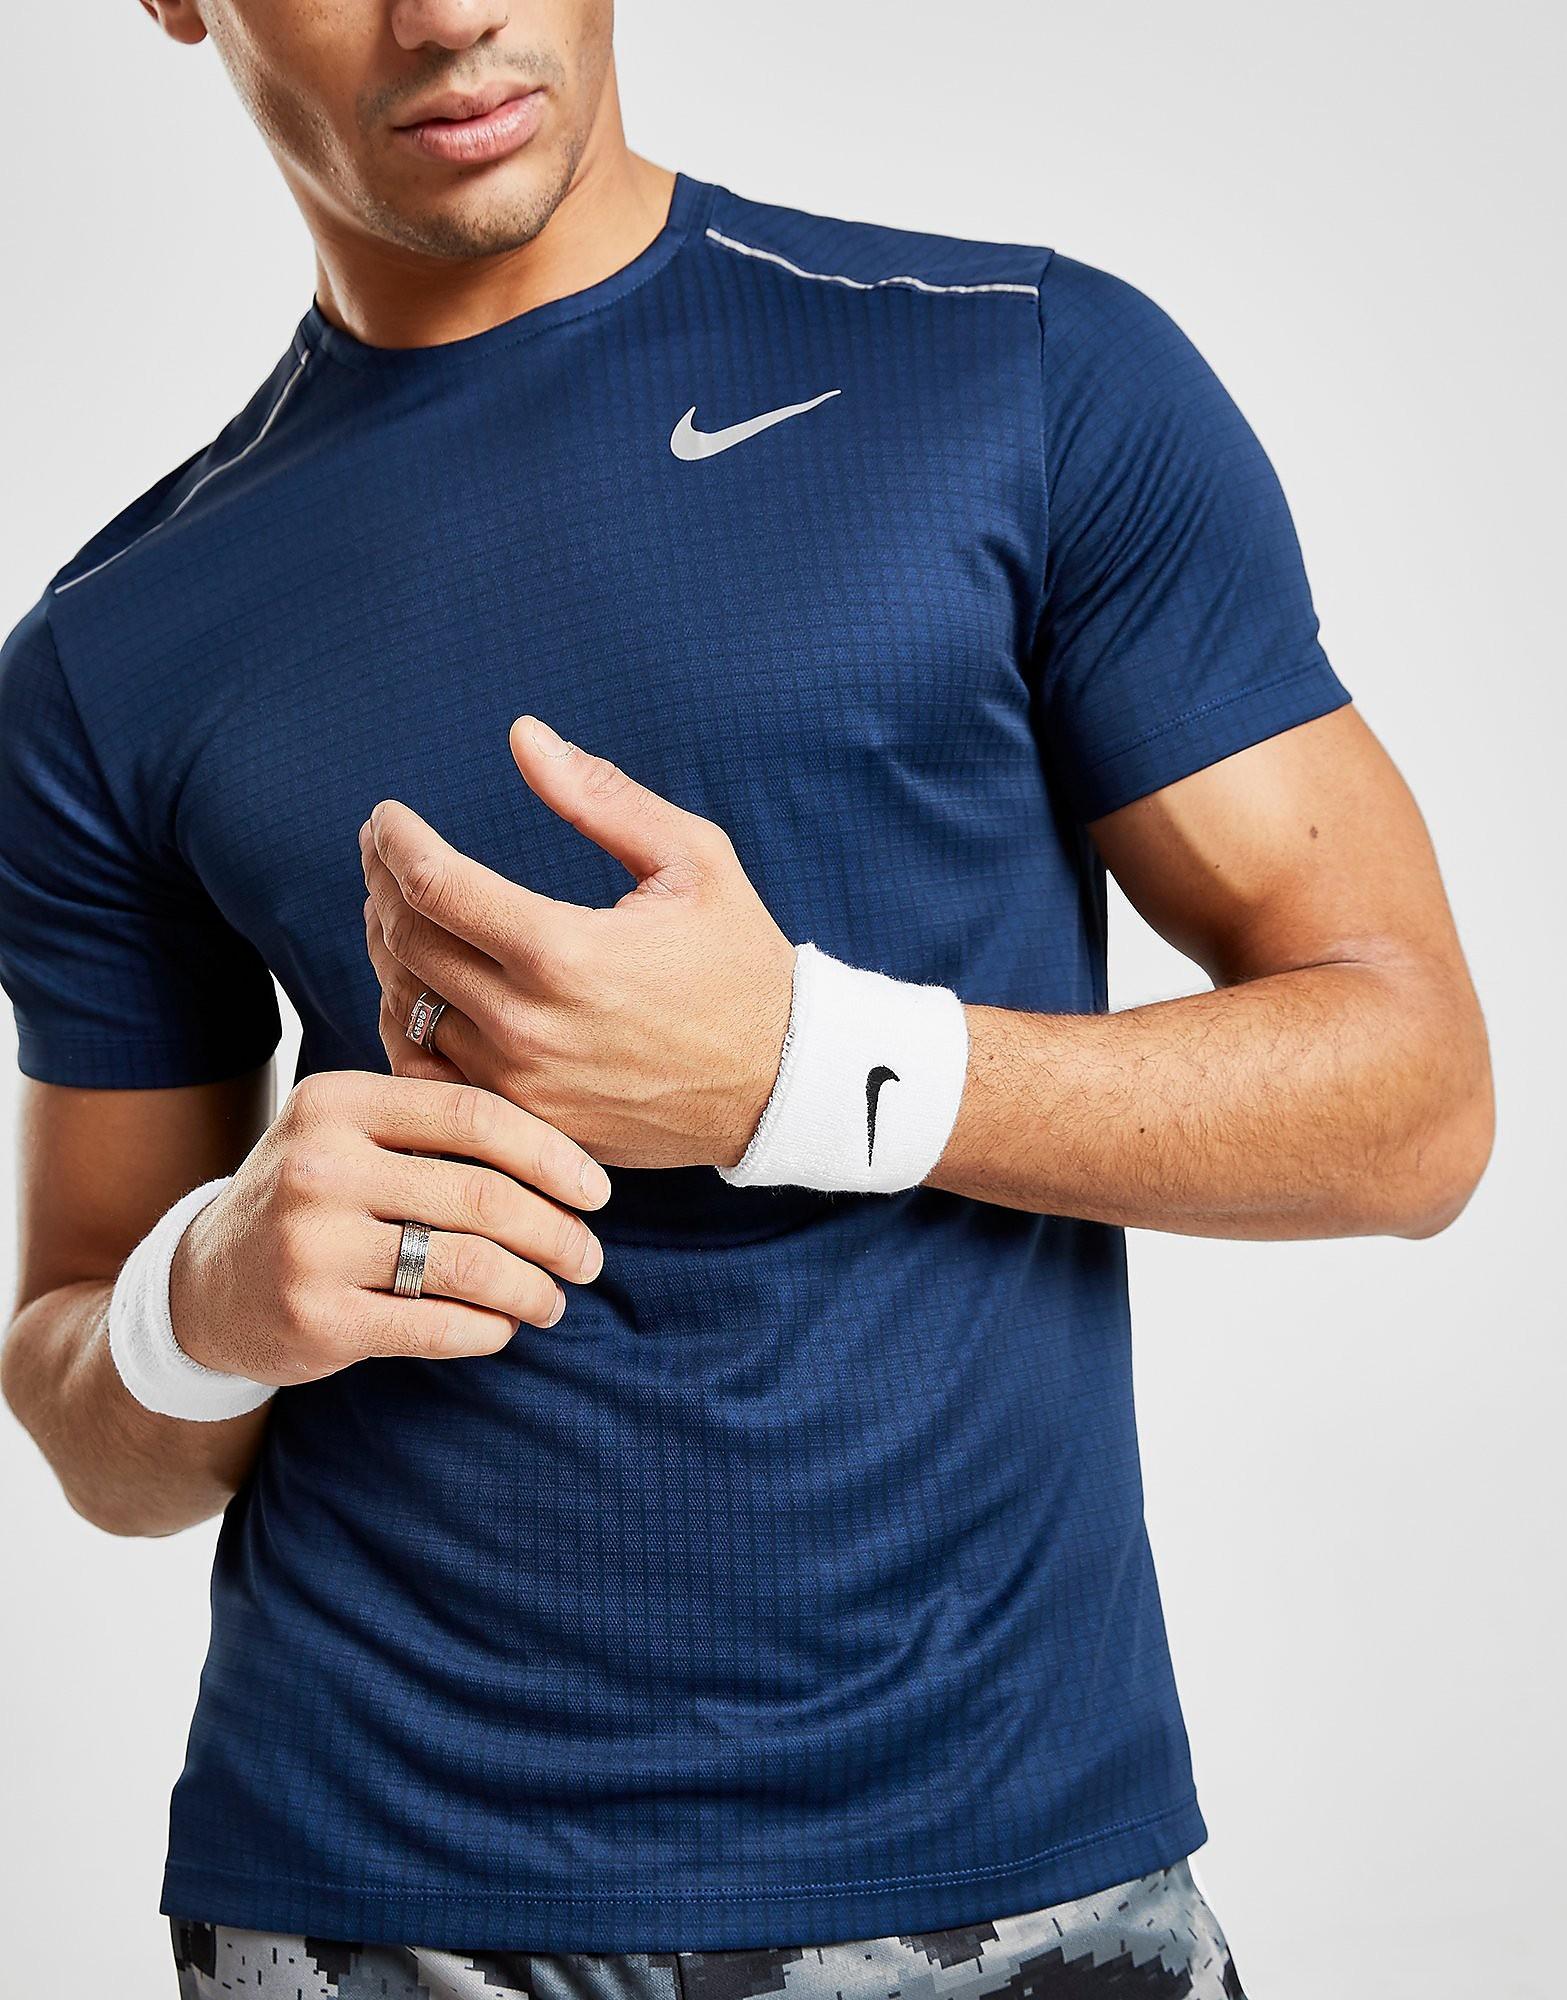 Nike 2 Pack Swoosh Wristband - White/Black - Mens, White/Black